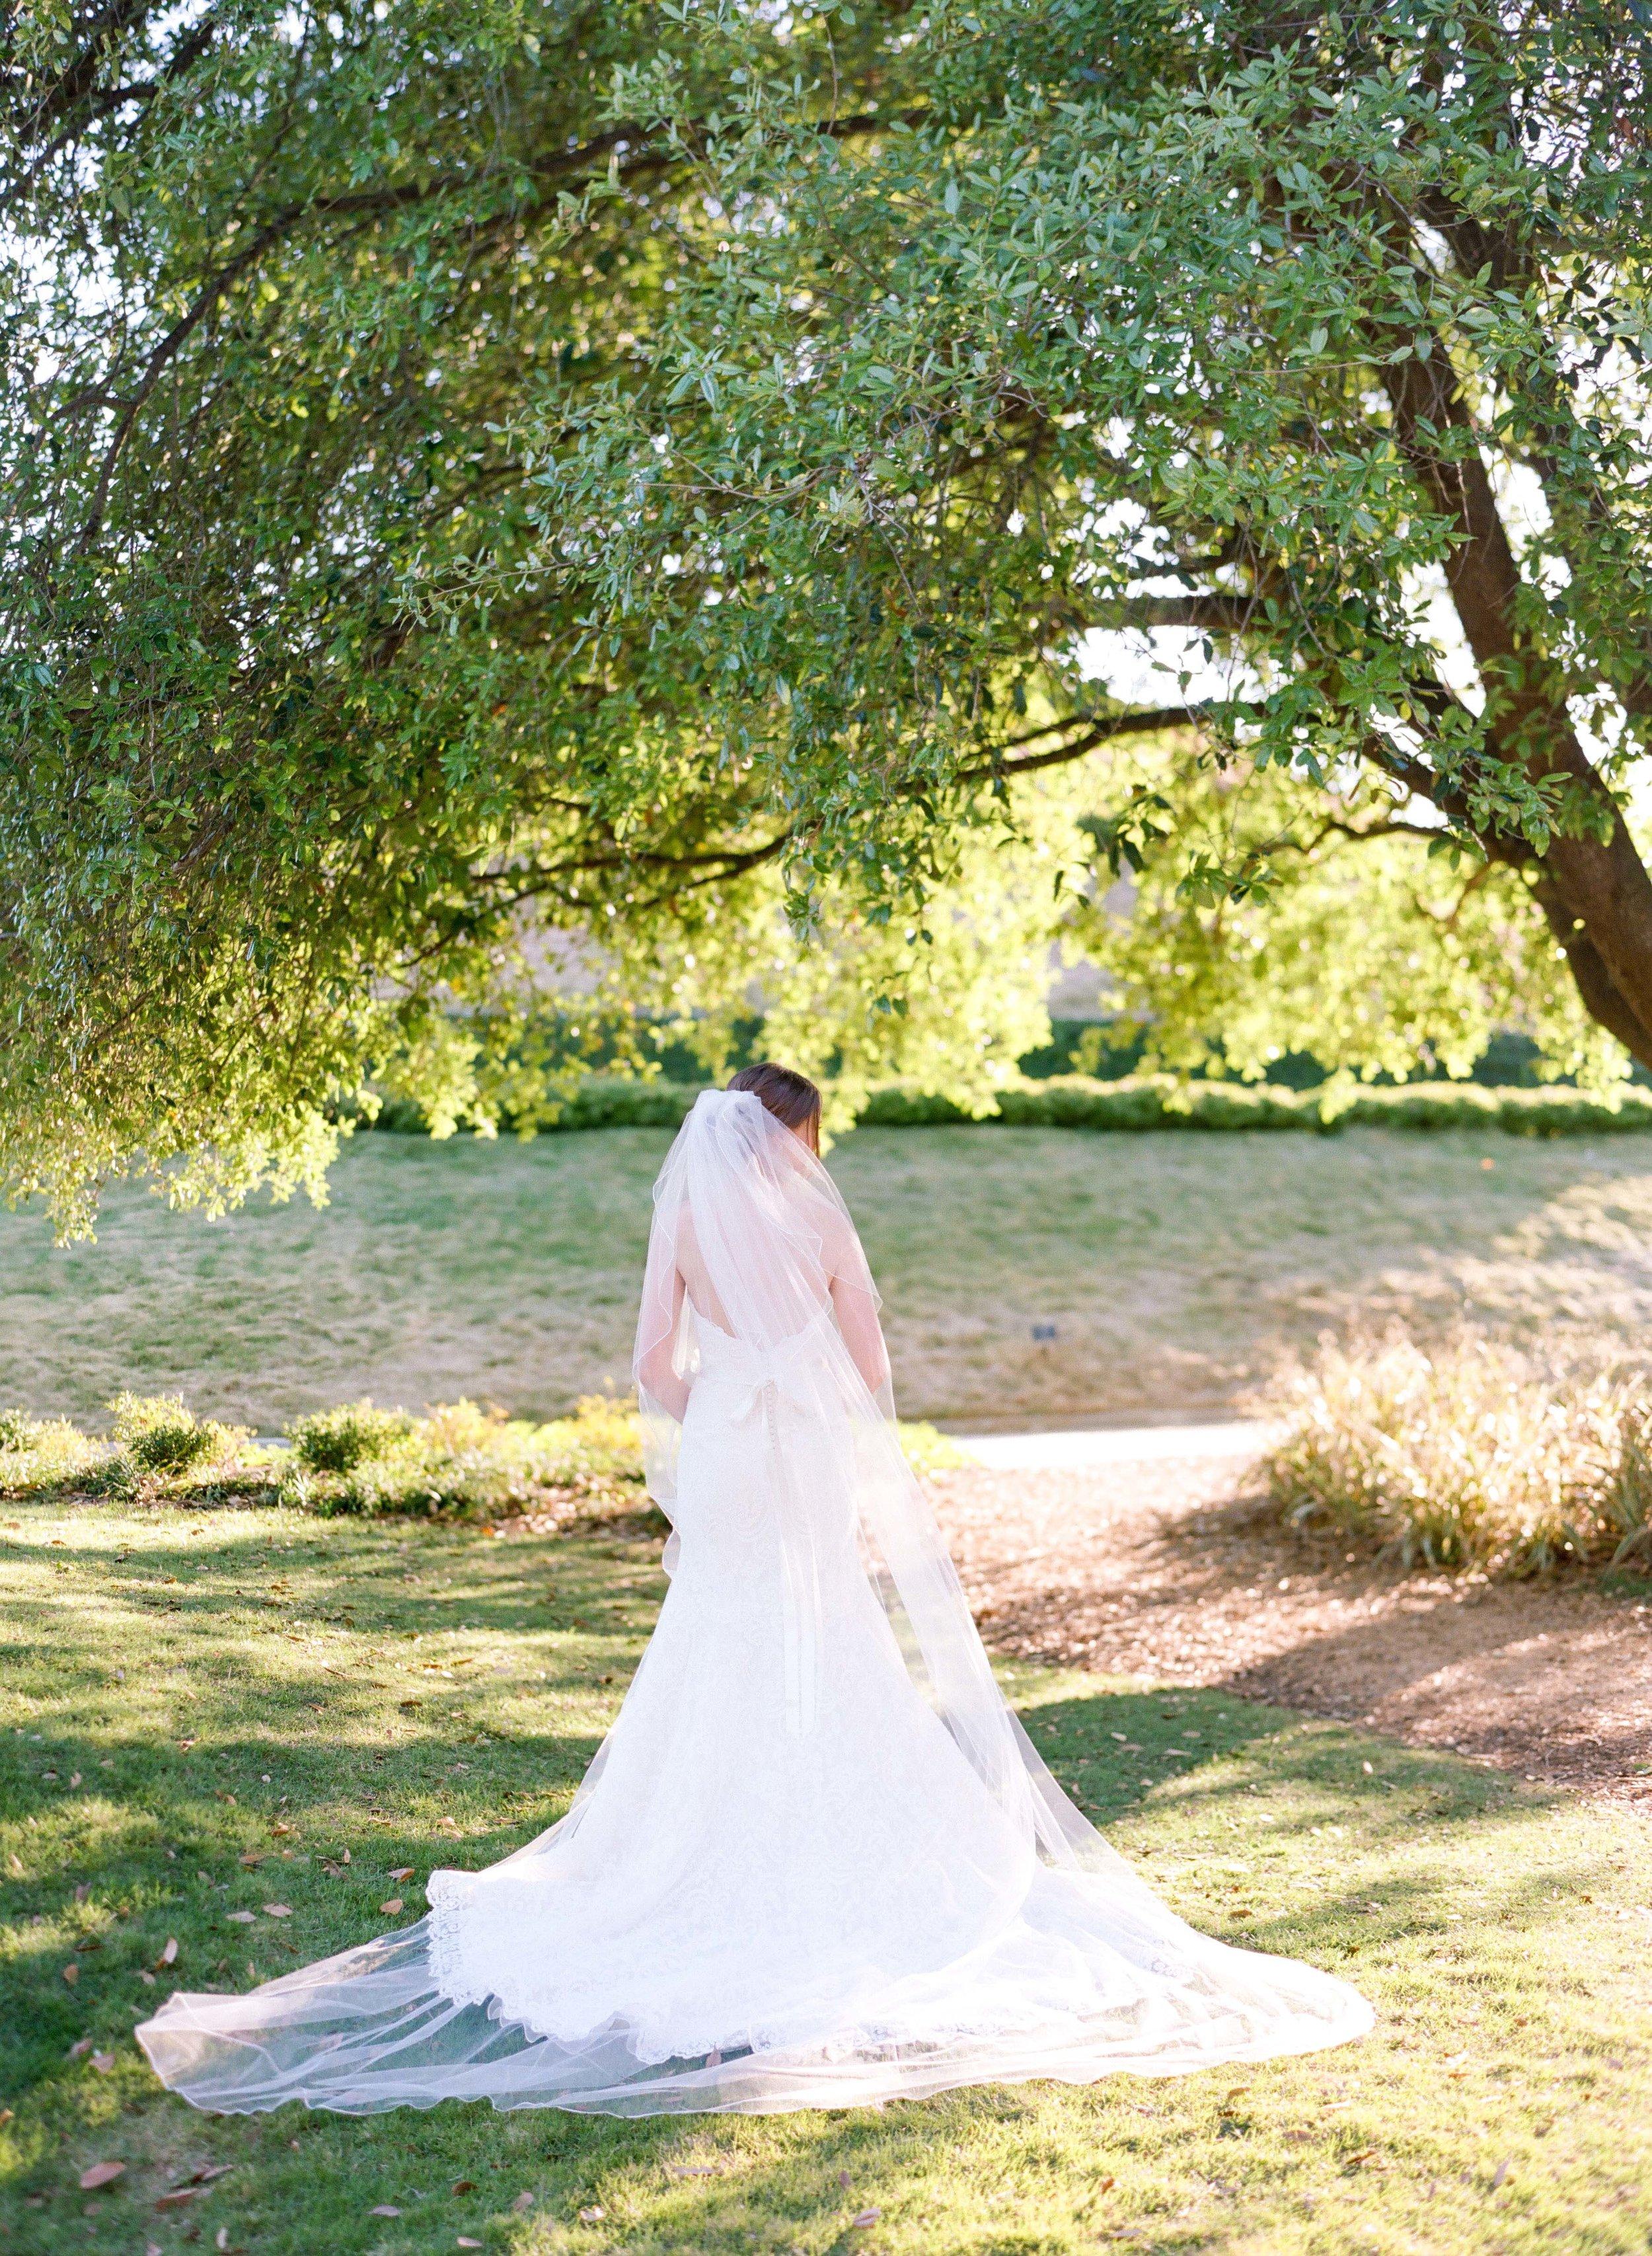 Houston-Wedding-Photographer-Film-Fine-Art-Bridals-Dana Fernandez-Photography-9.jpg